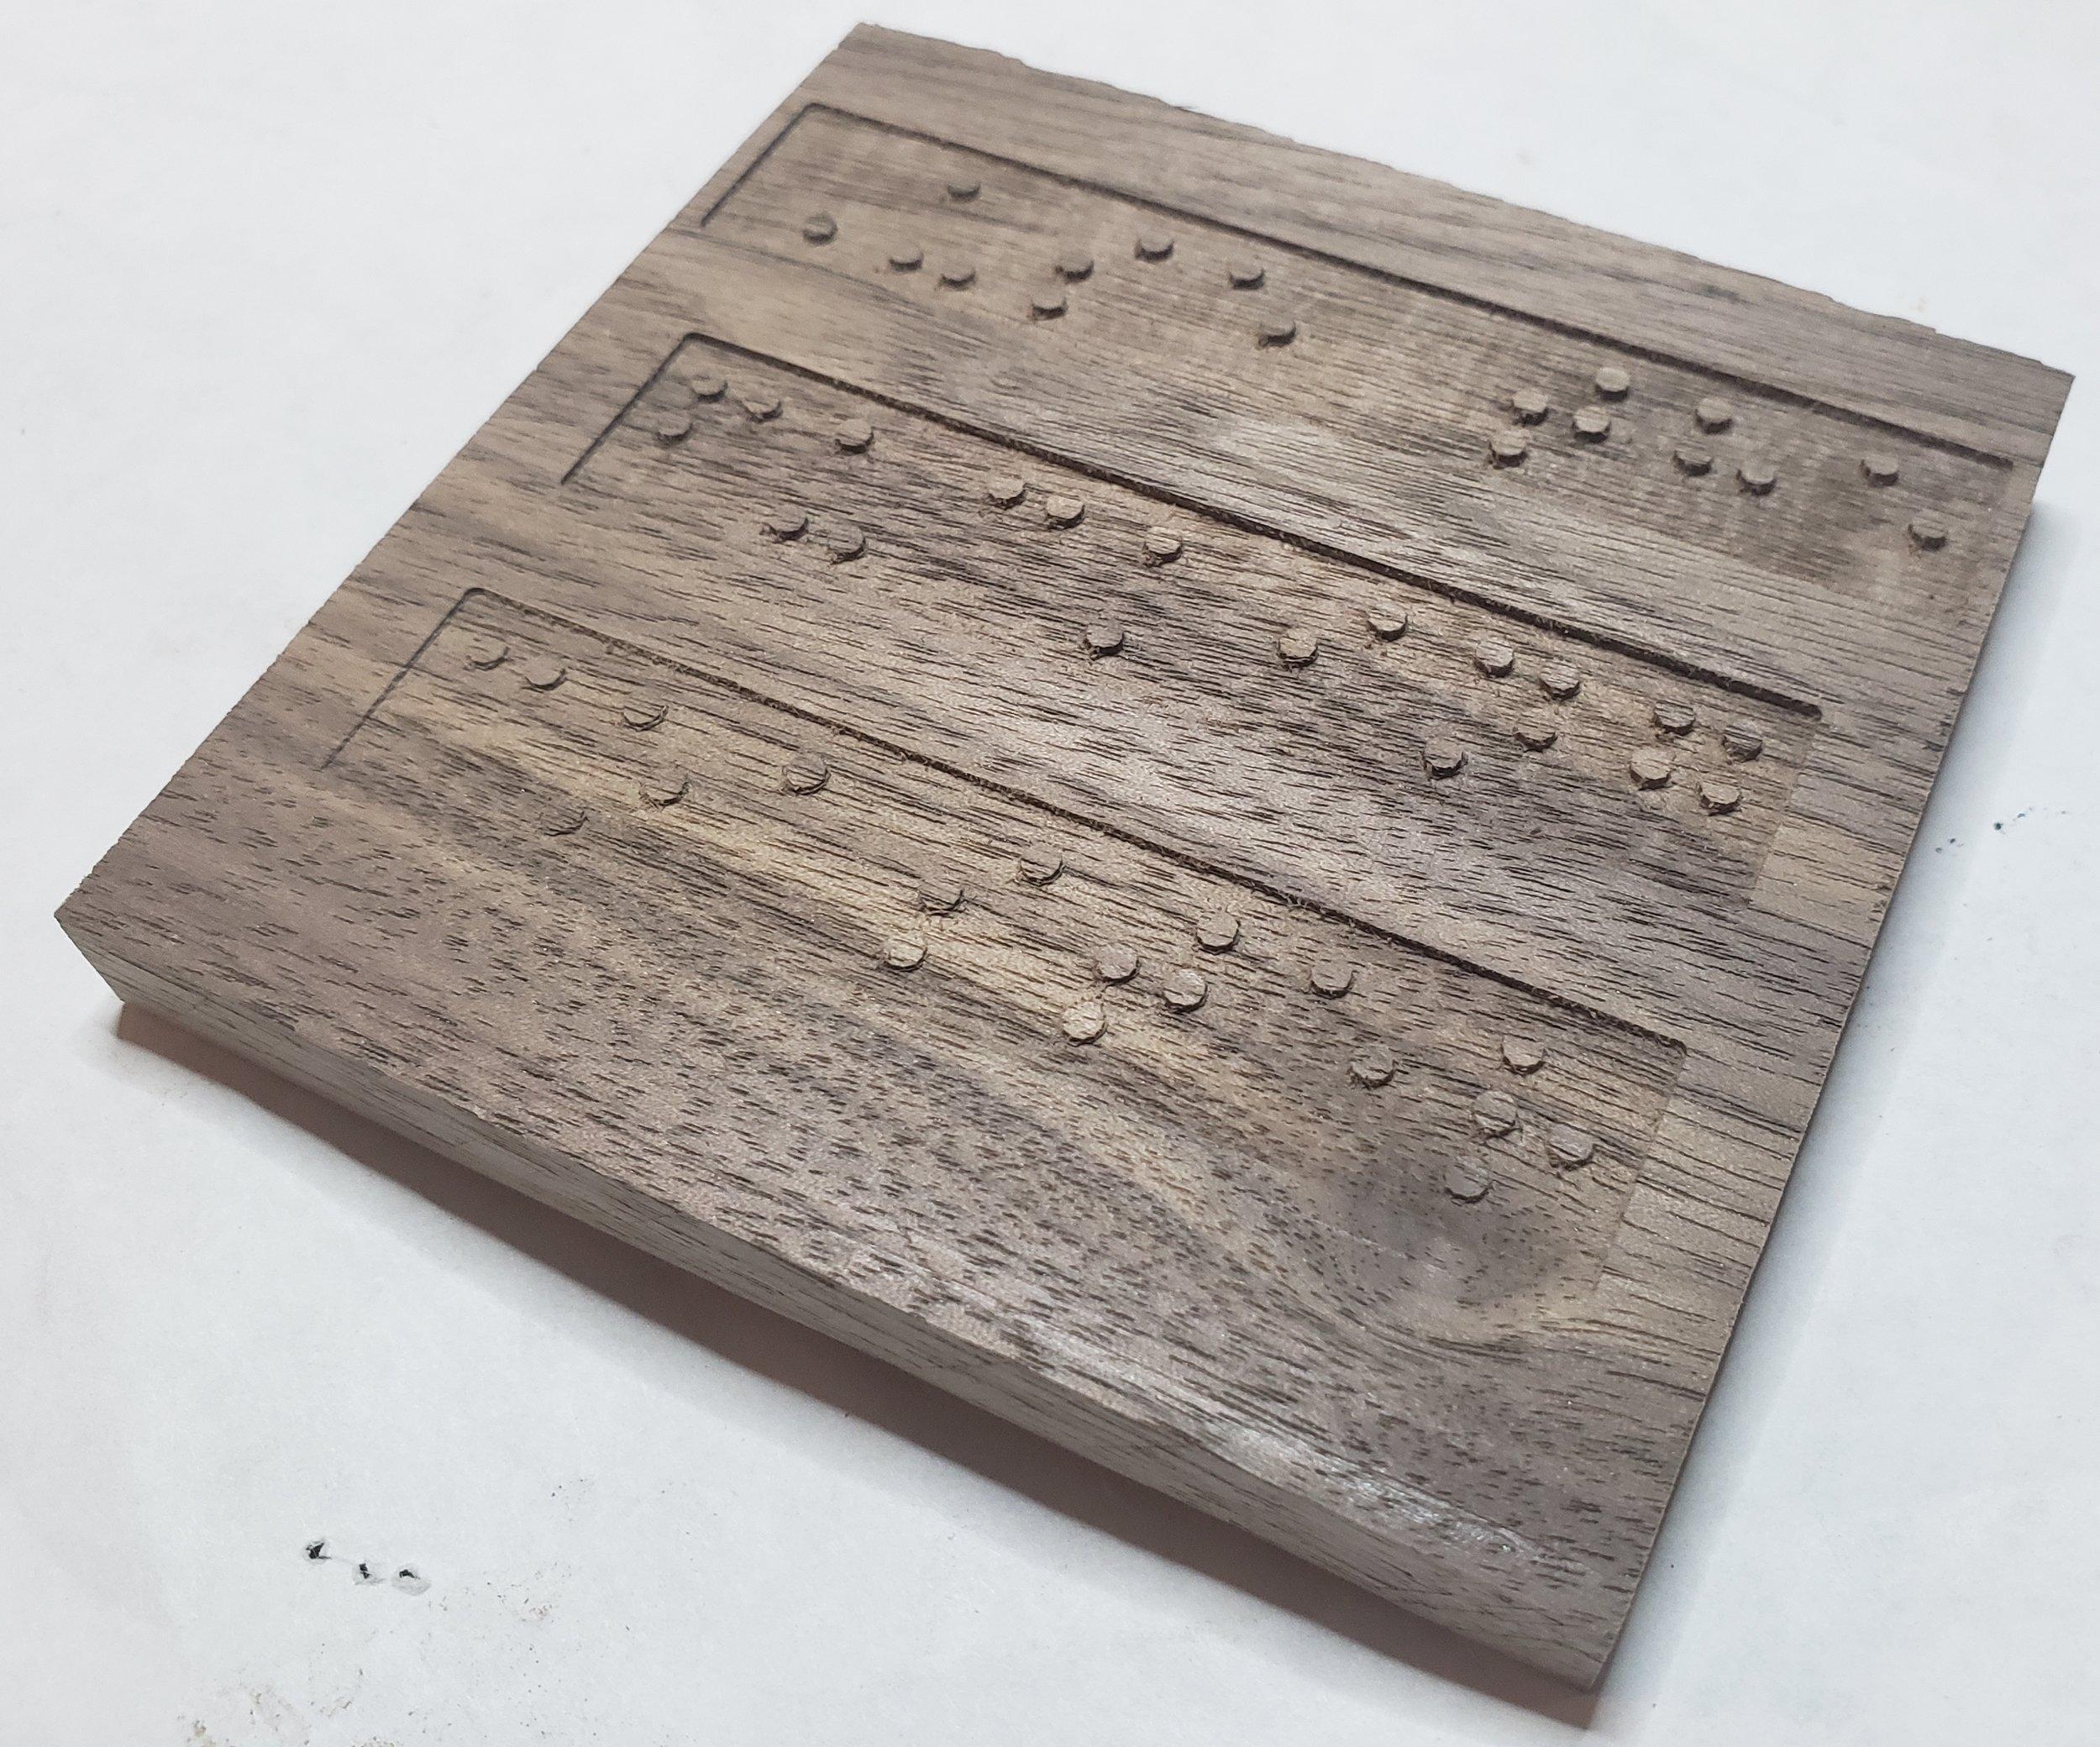 Braille-Engraving.jpg